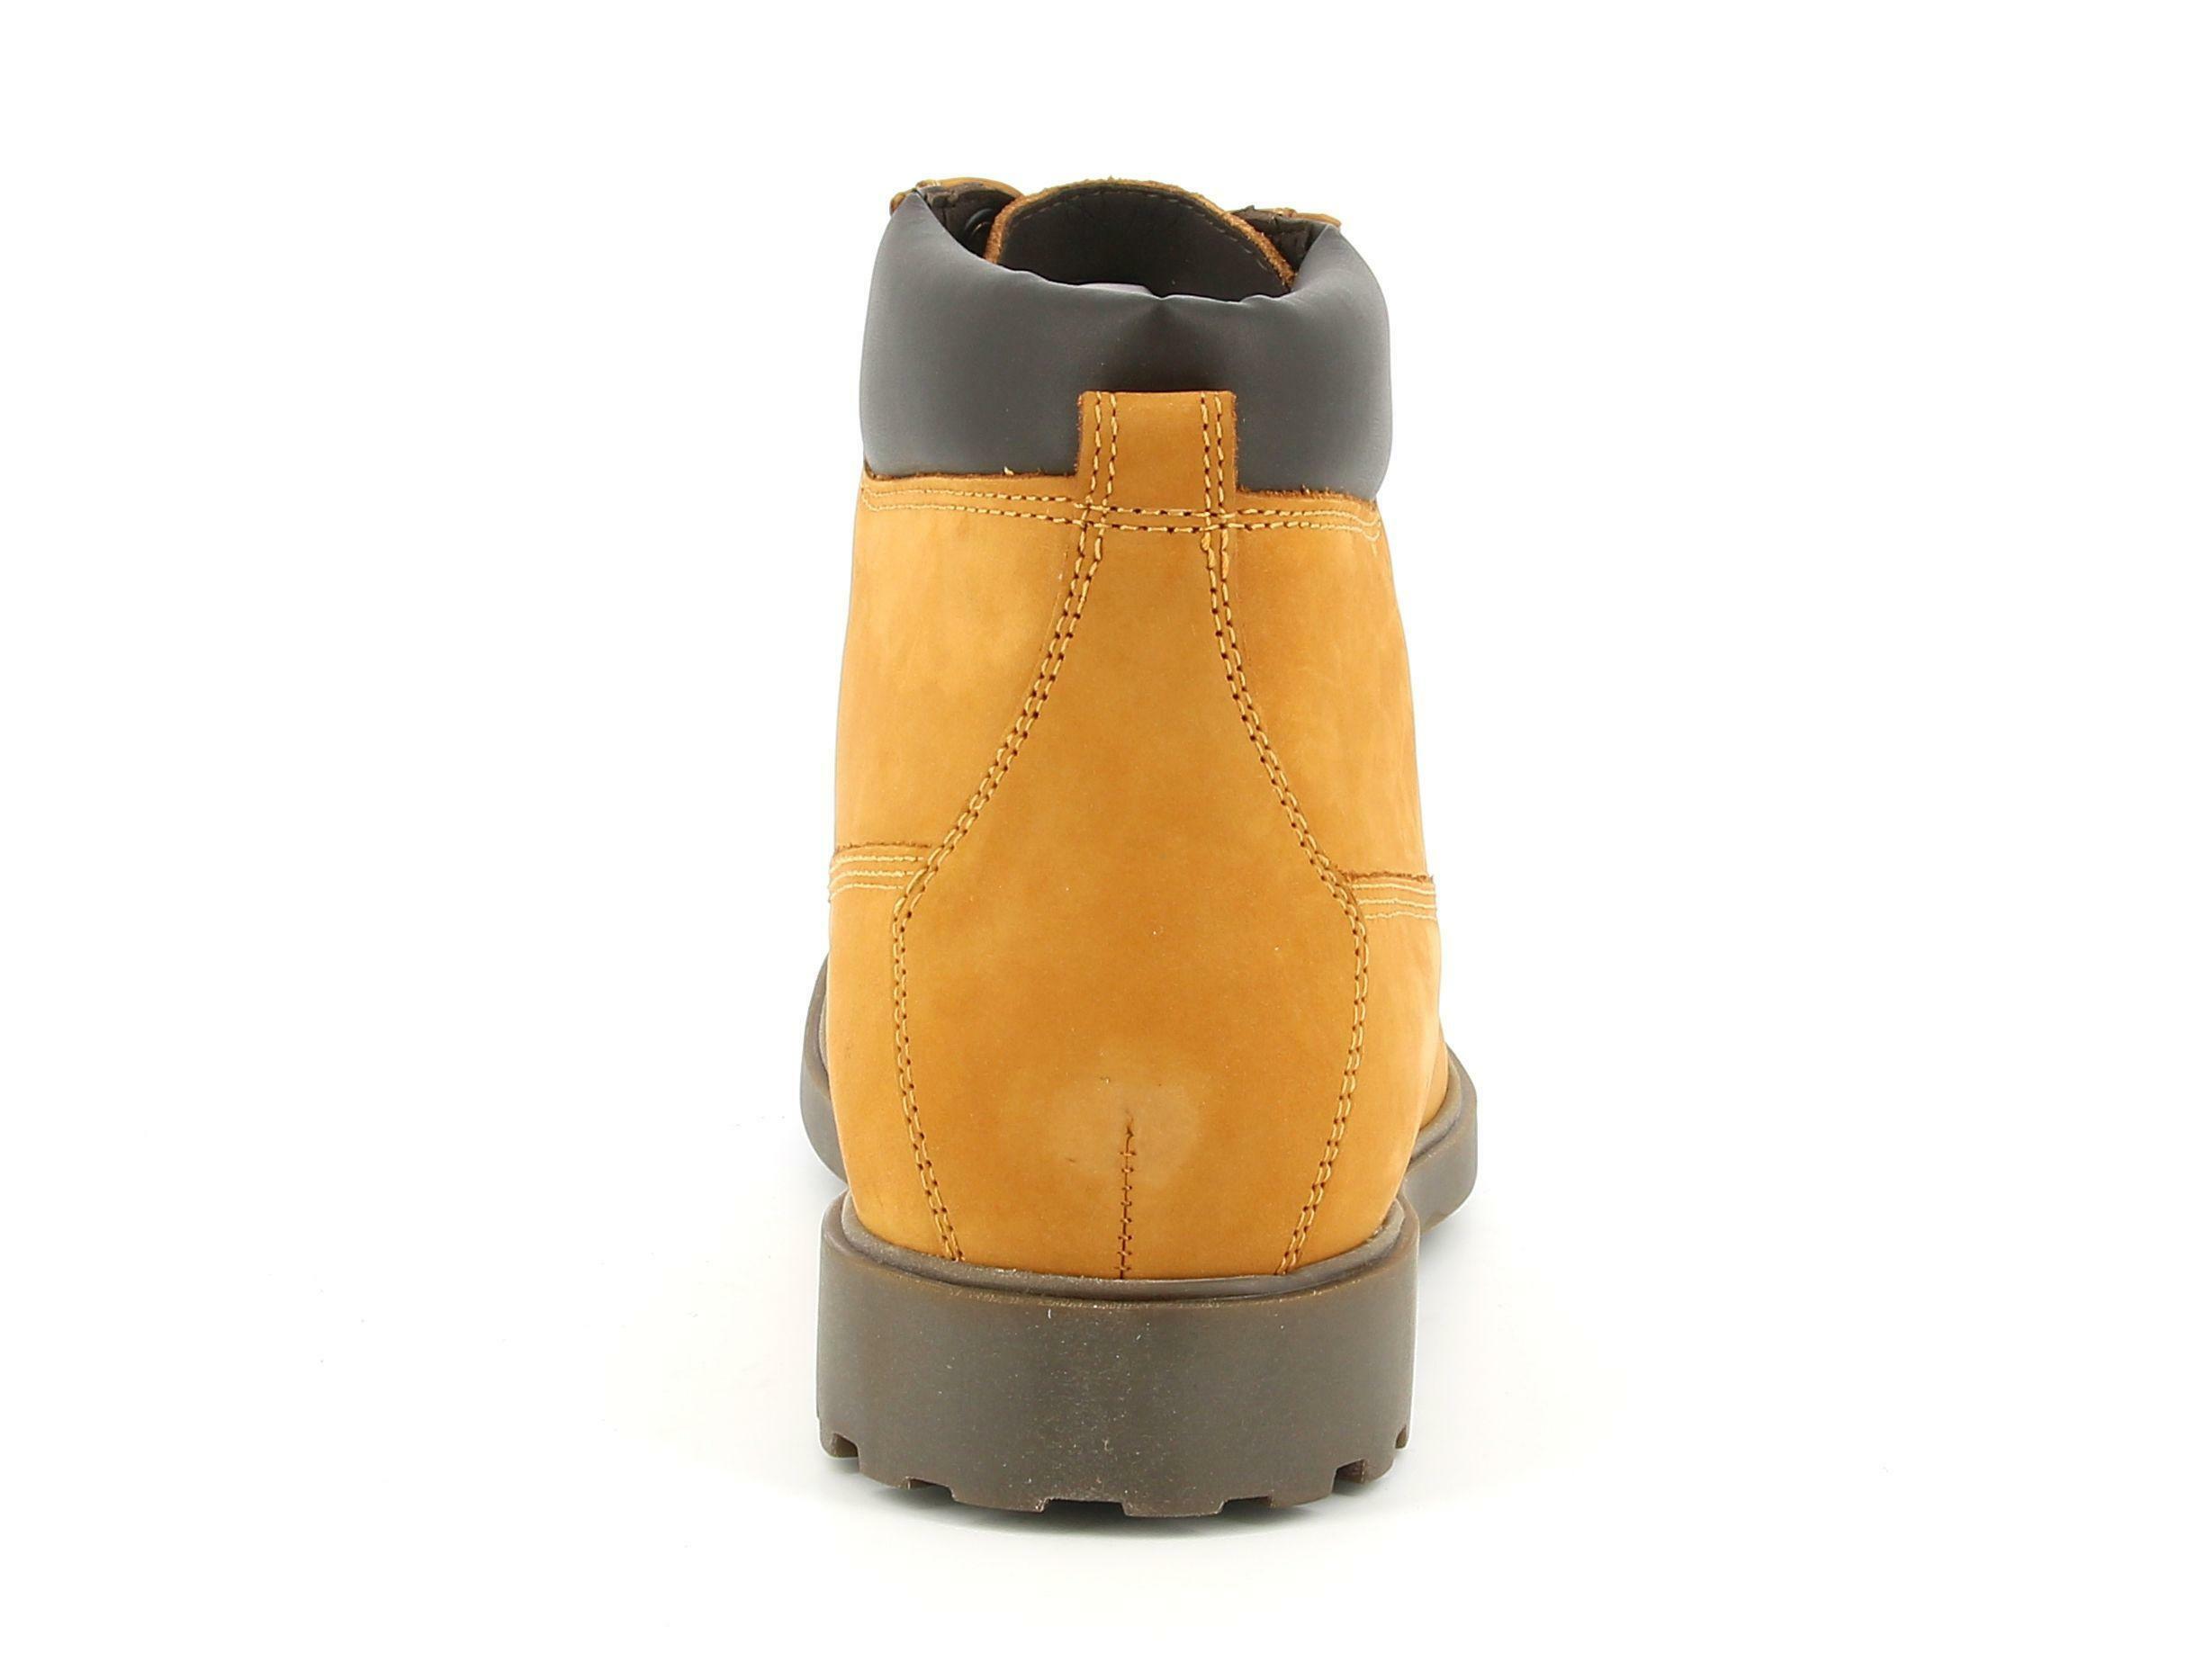 geox geox u rhadalf f u045hf 00032 c5046 giallo scarponcino invernale da uomo